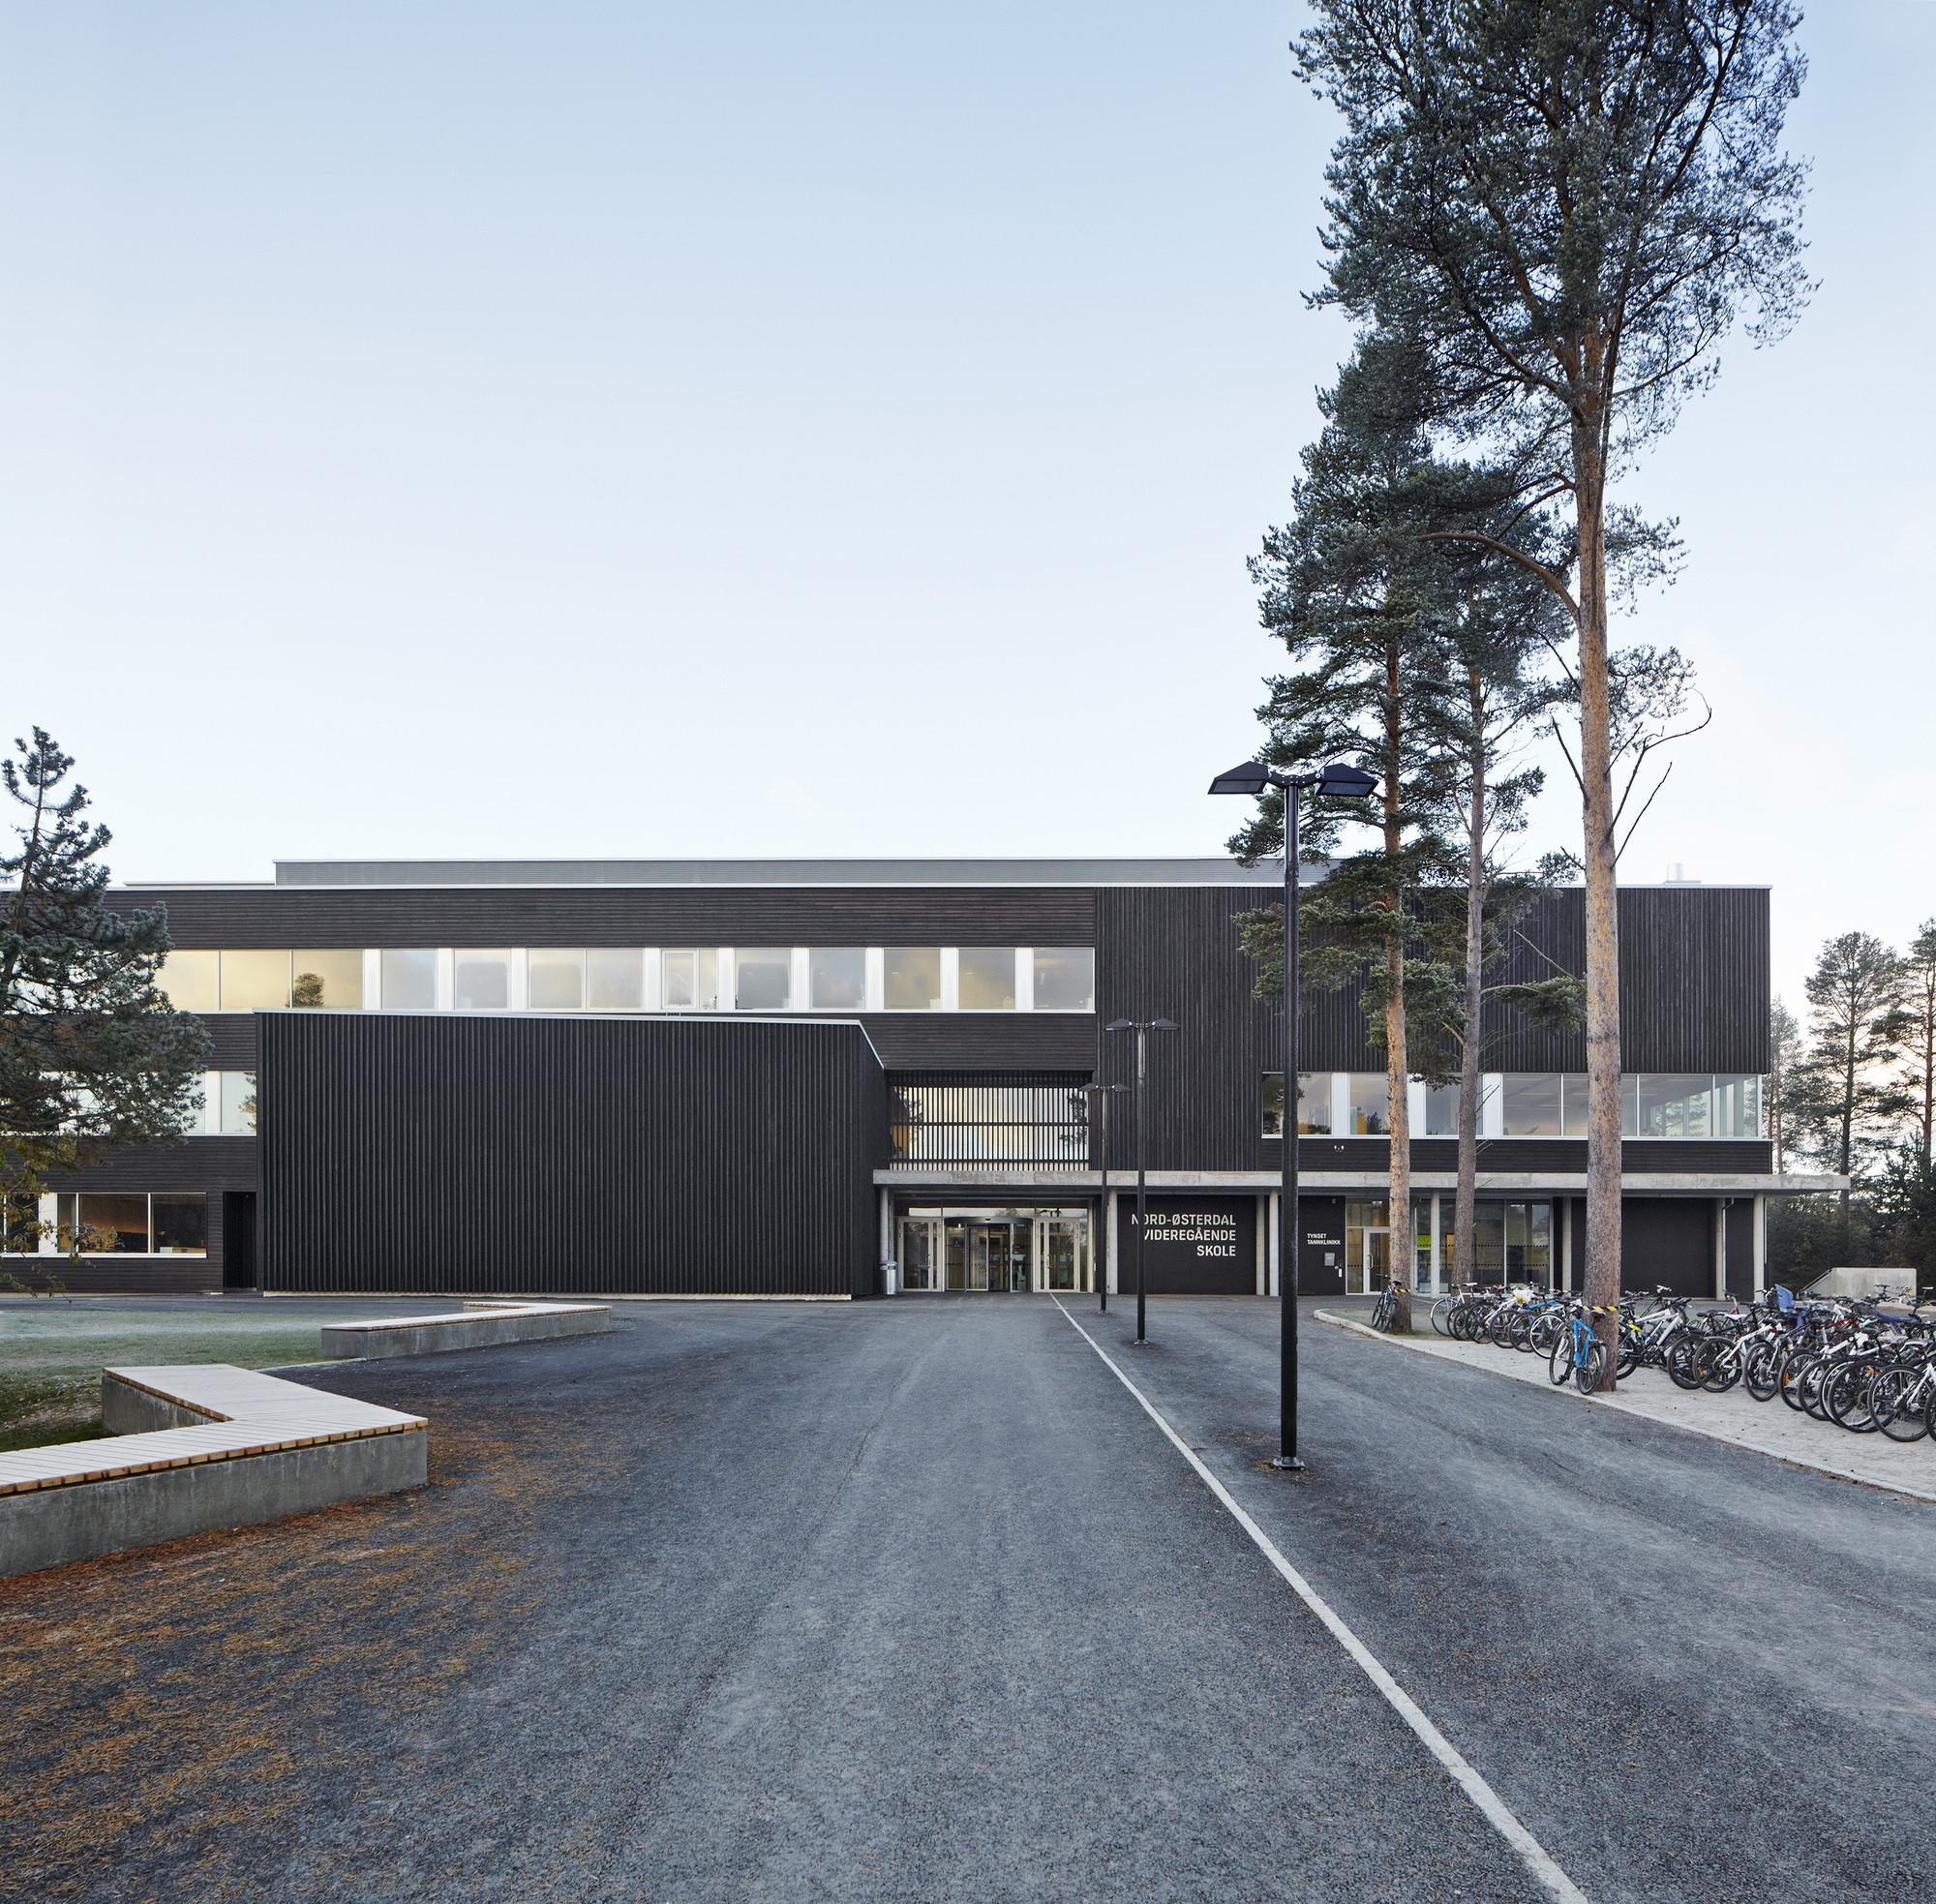 Escuela Secundaria Nord-Østerdal / Longva arkitekter